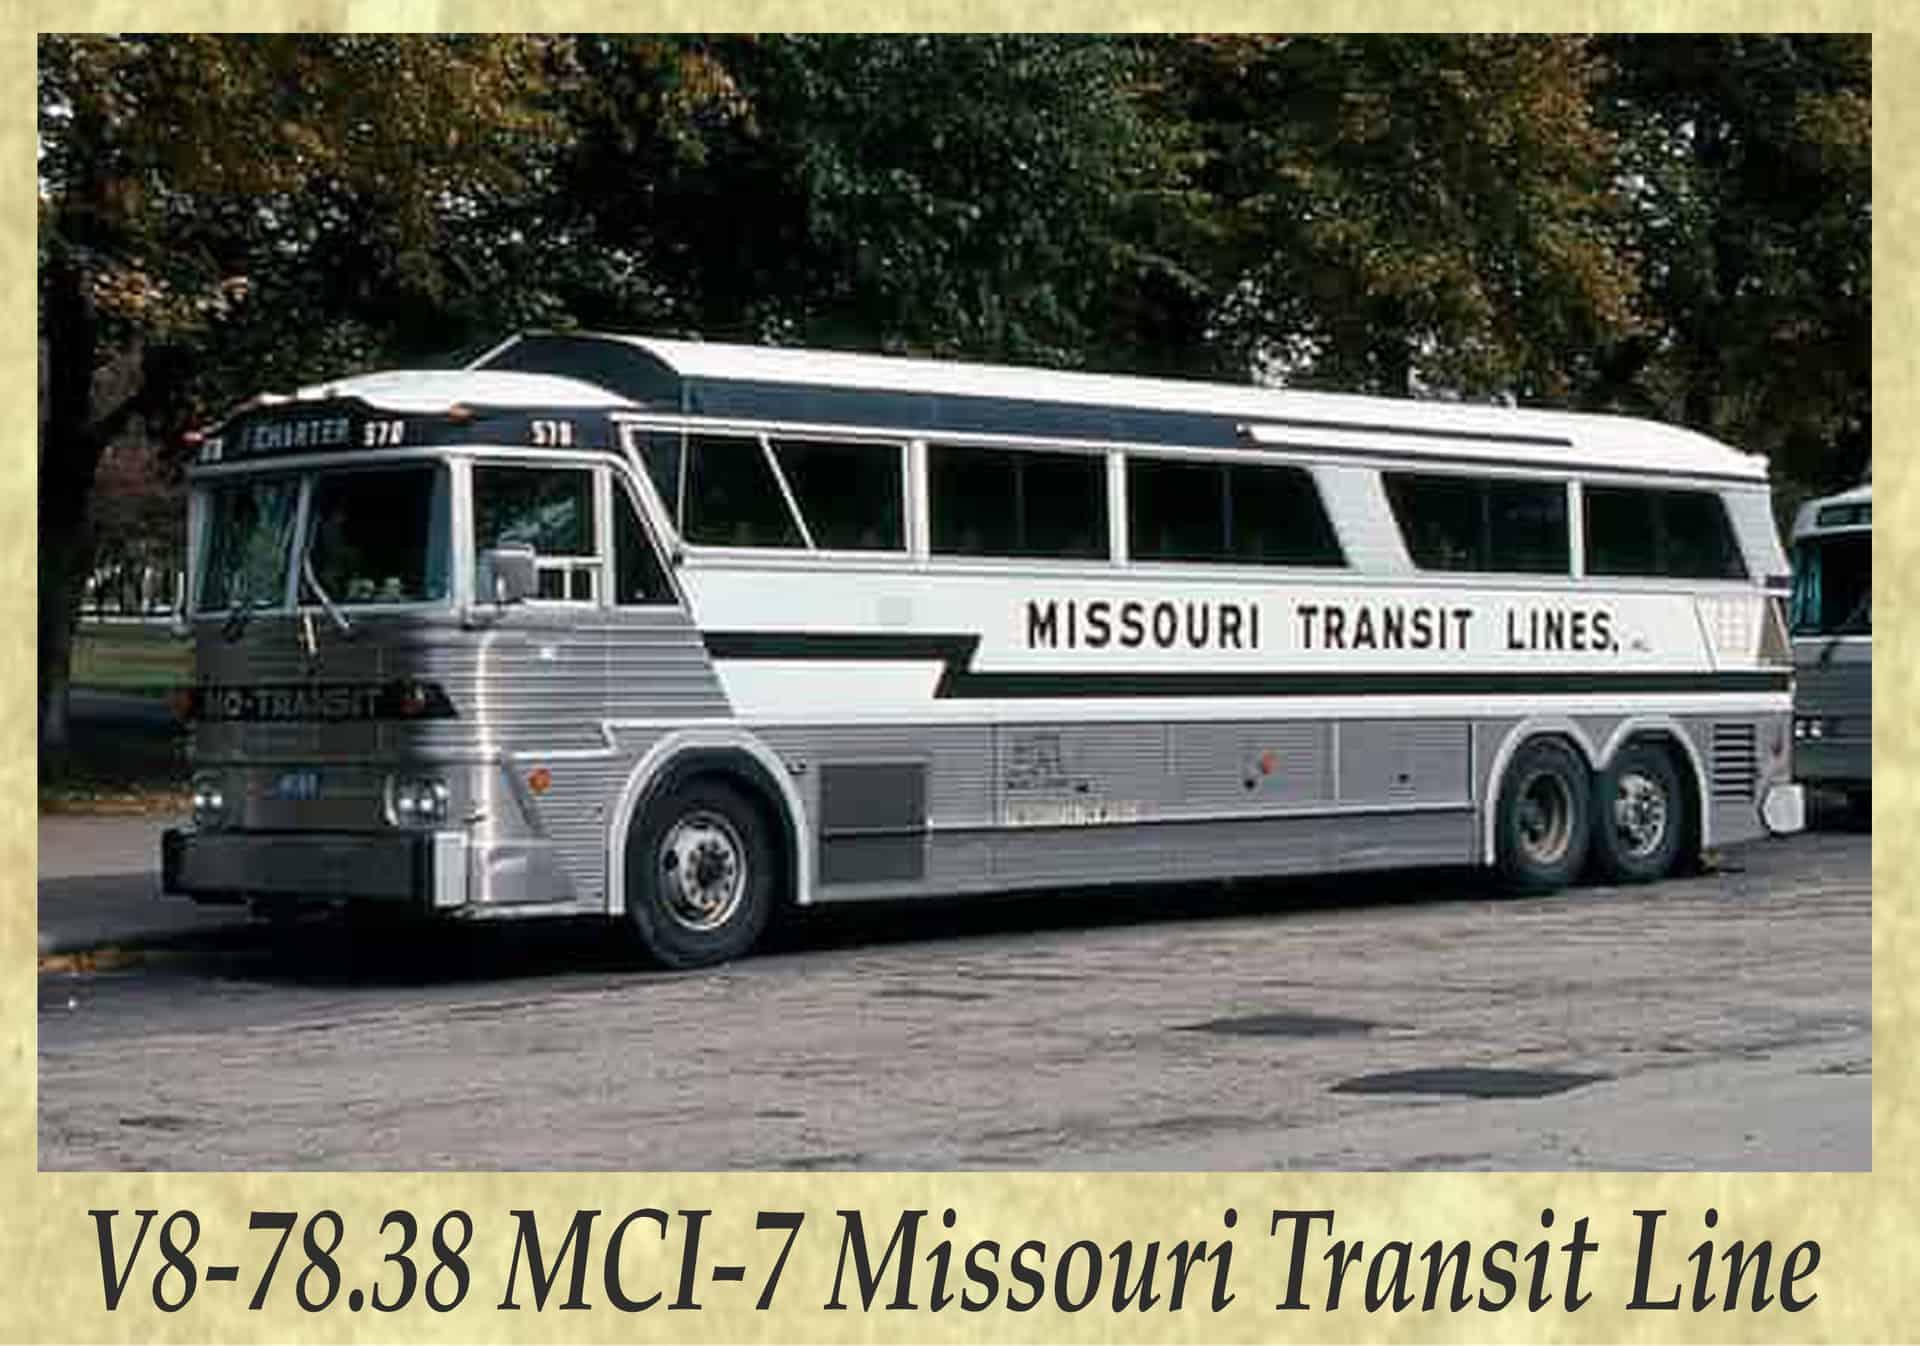 V8-78.38 MCI-7 Missouri Transit Line